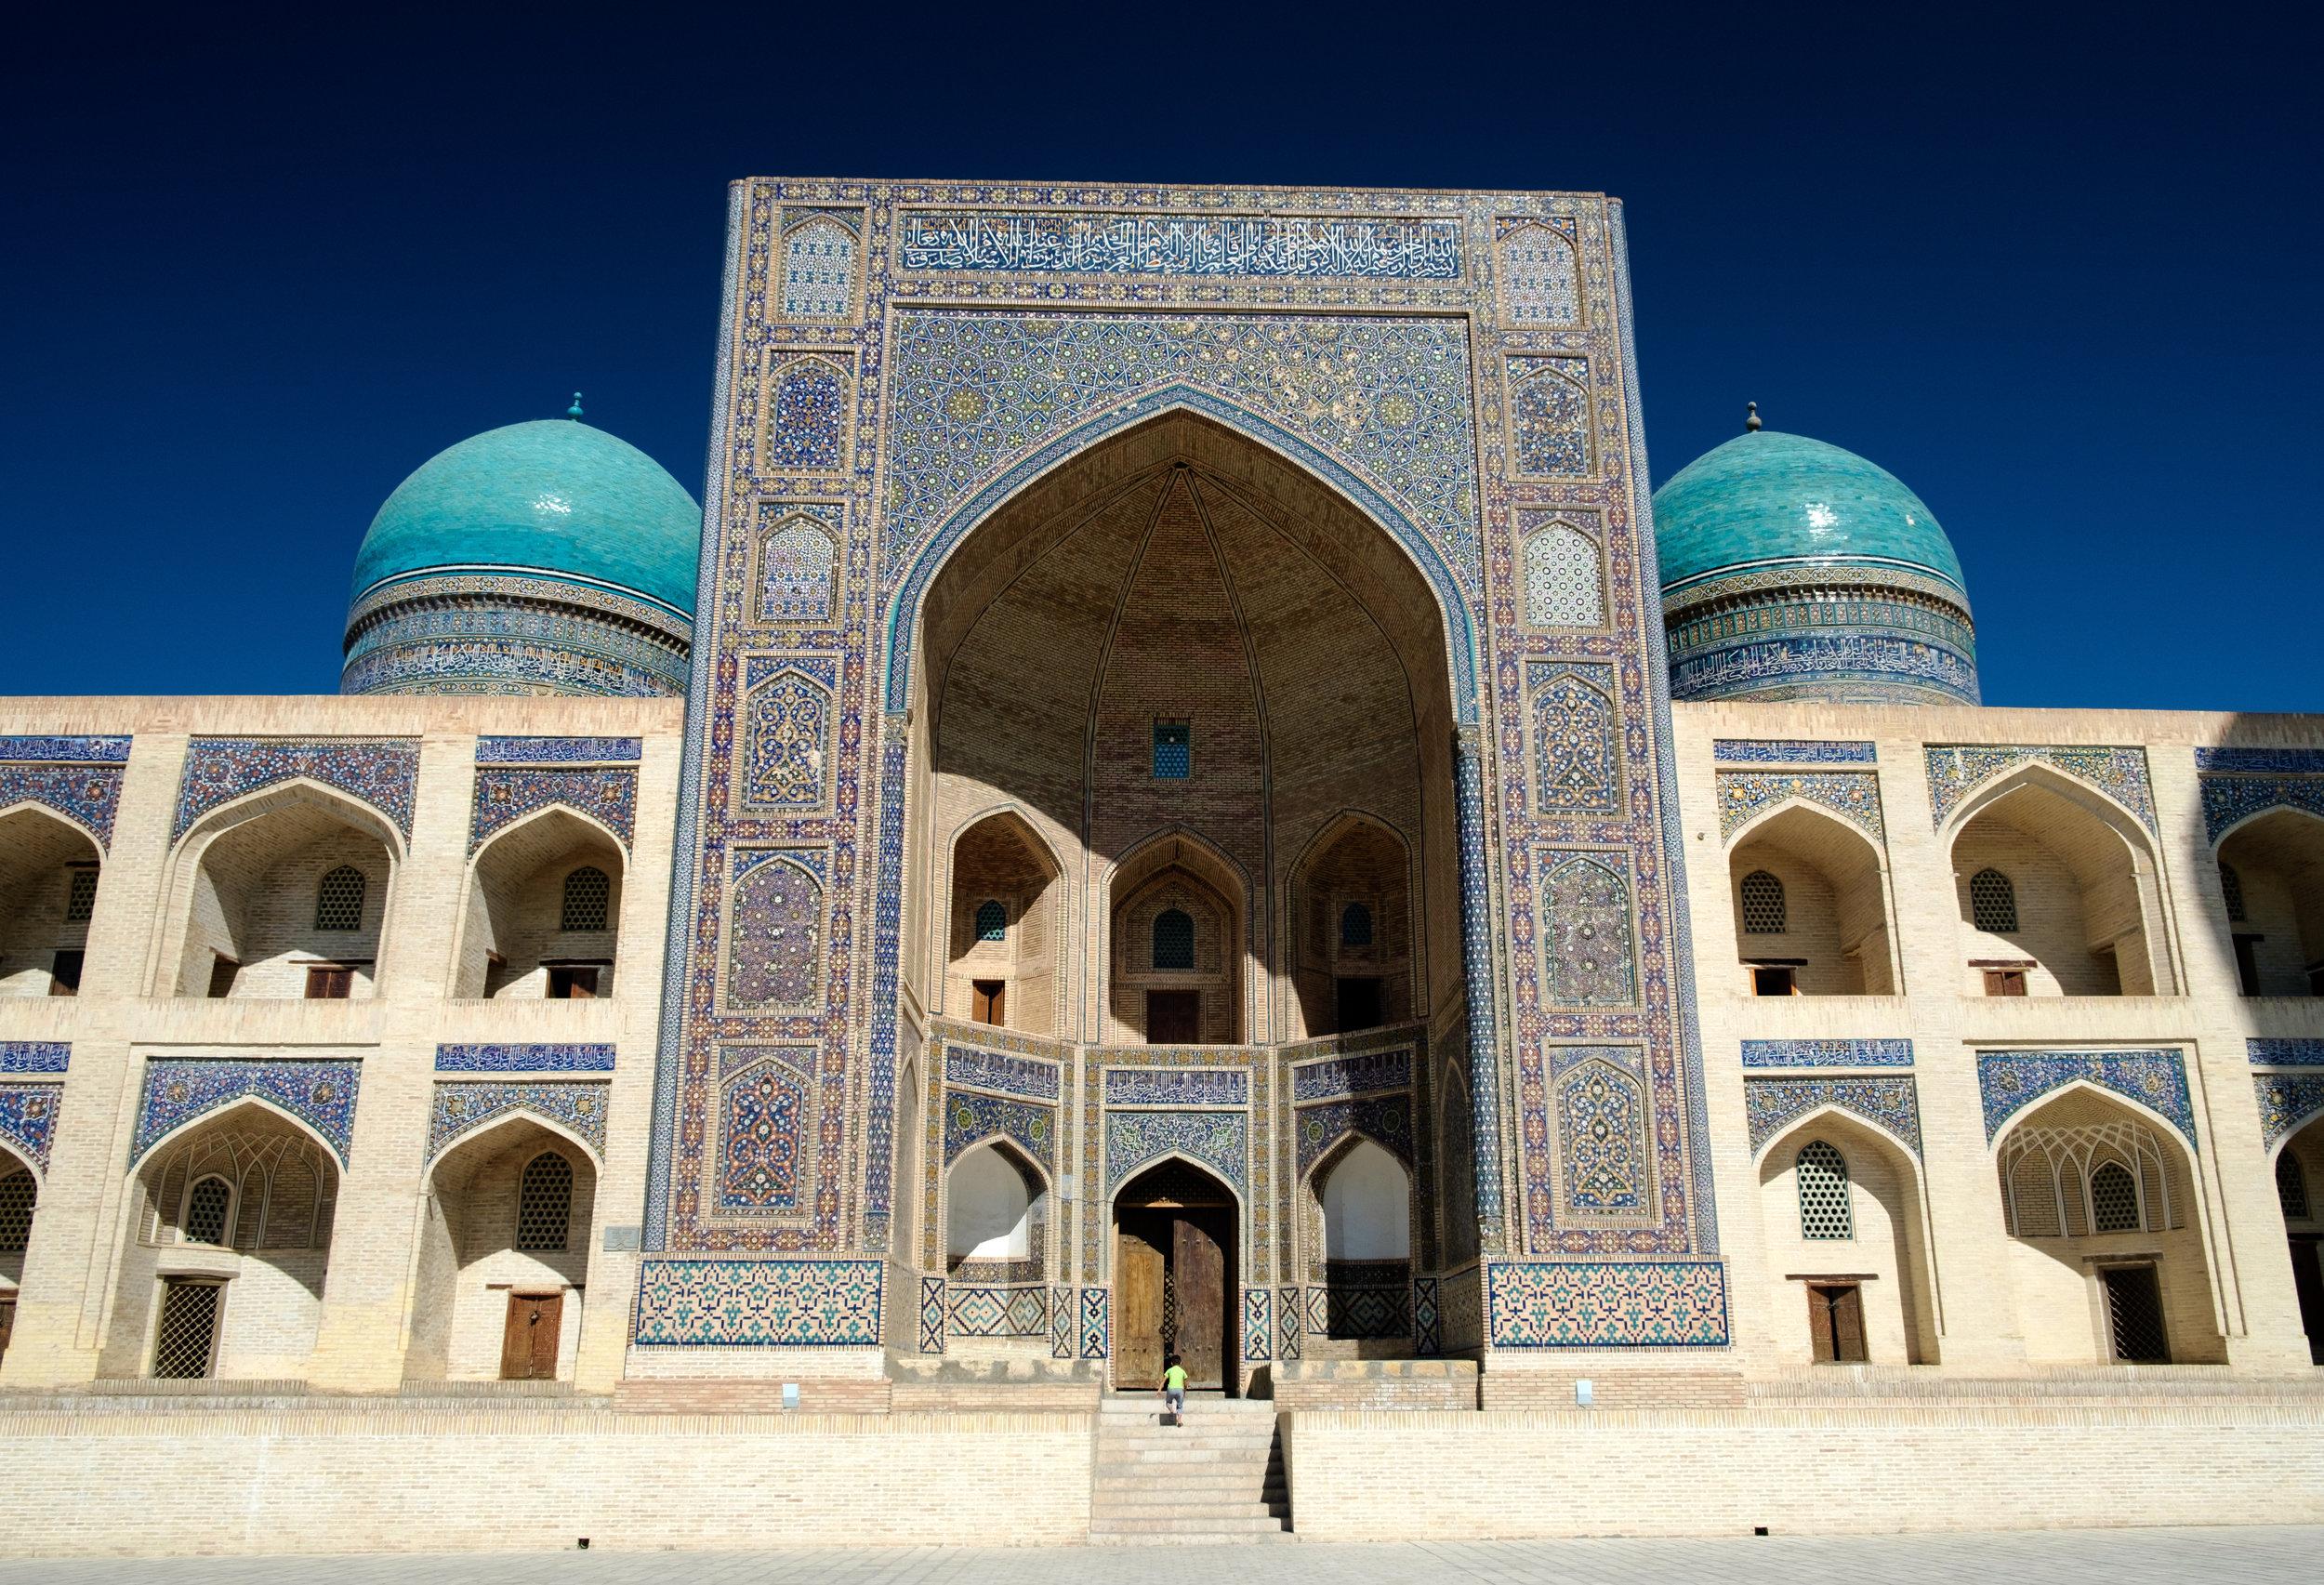 Le madrasa (ou école) Mir-i-Arab, où on y enseigne la religion.